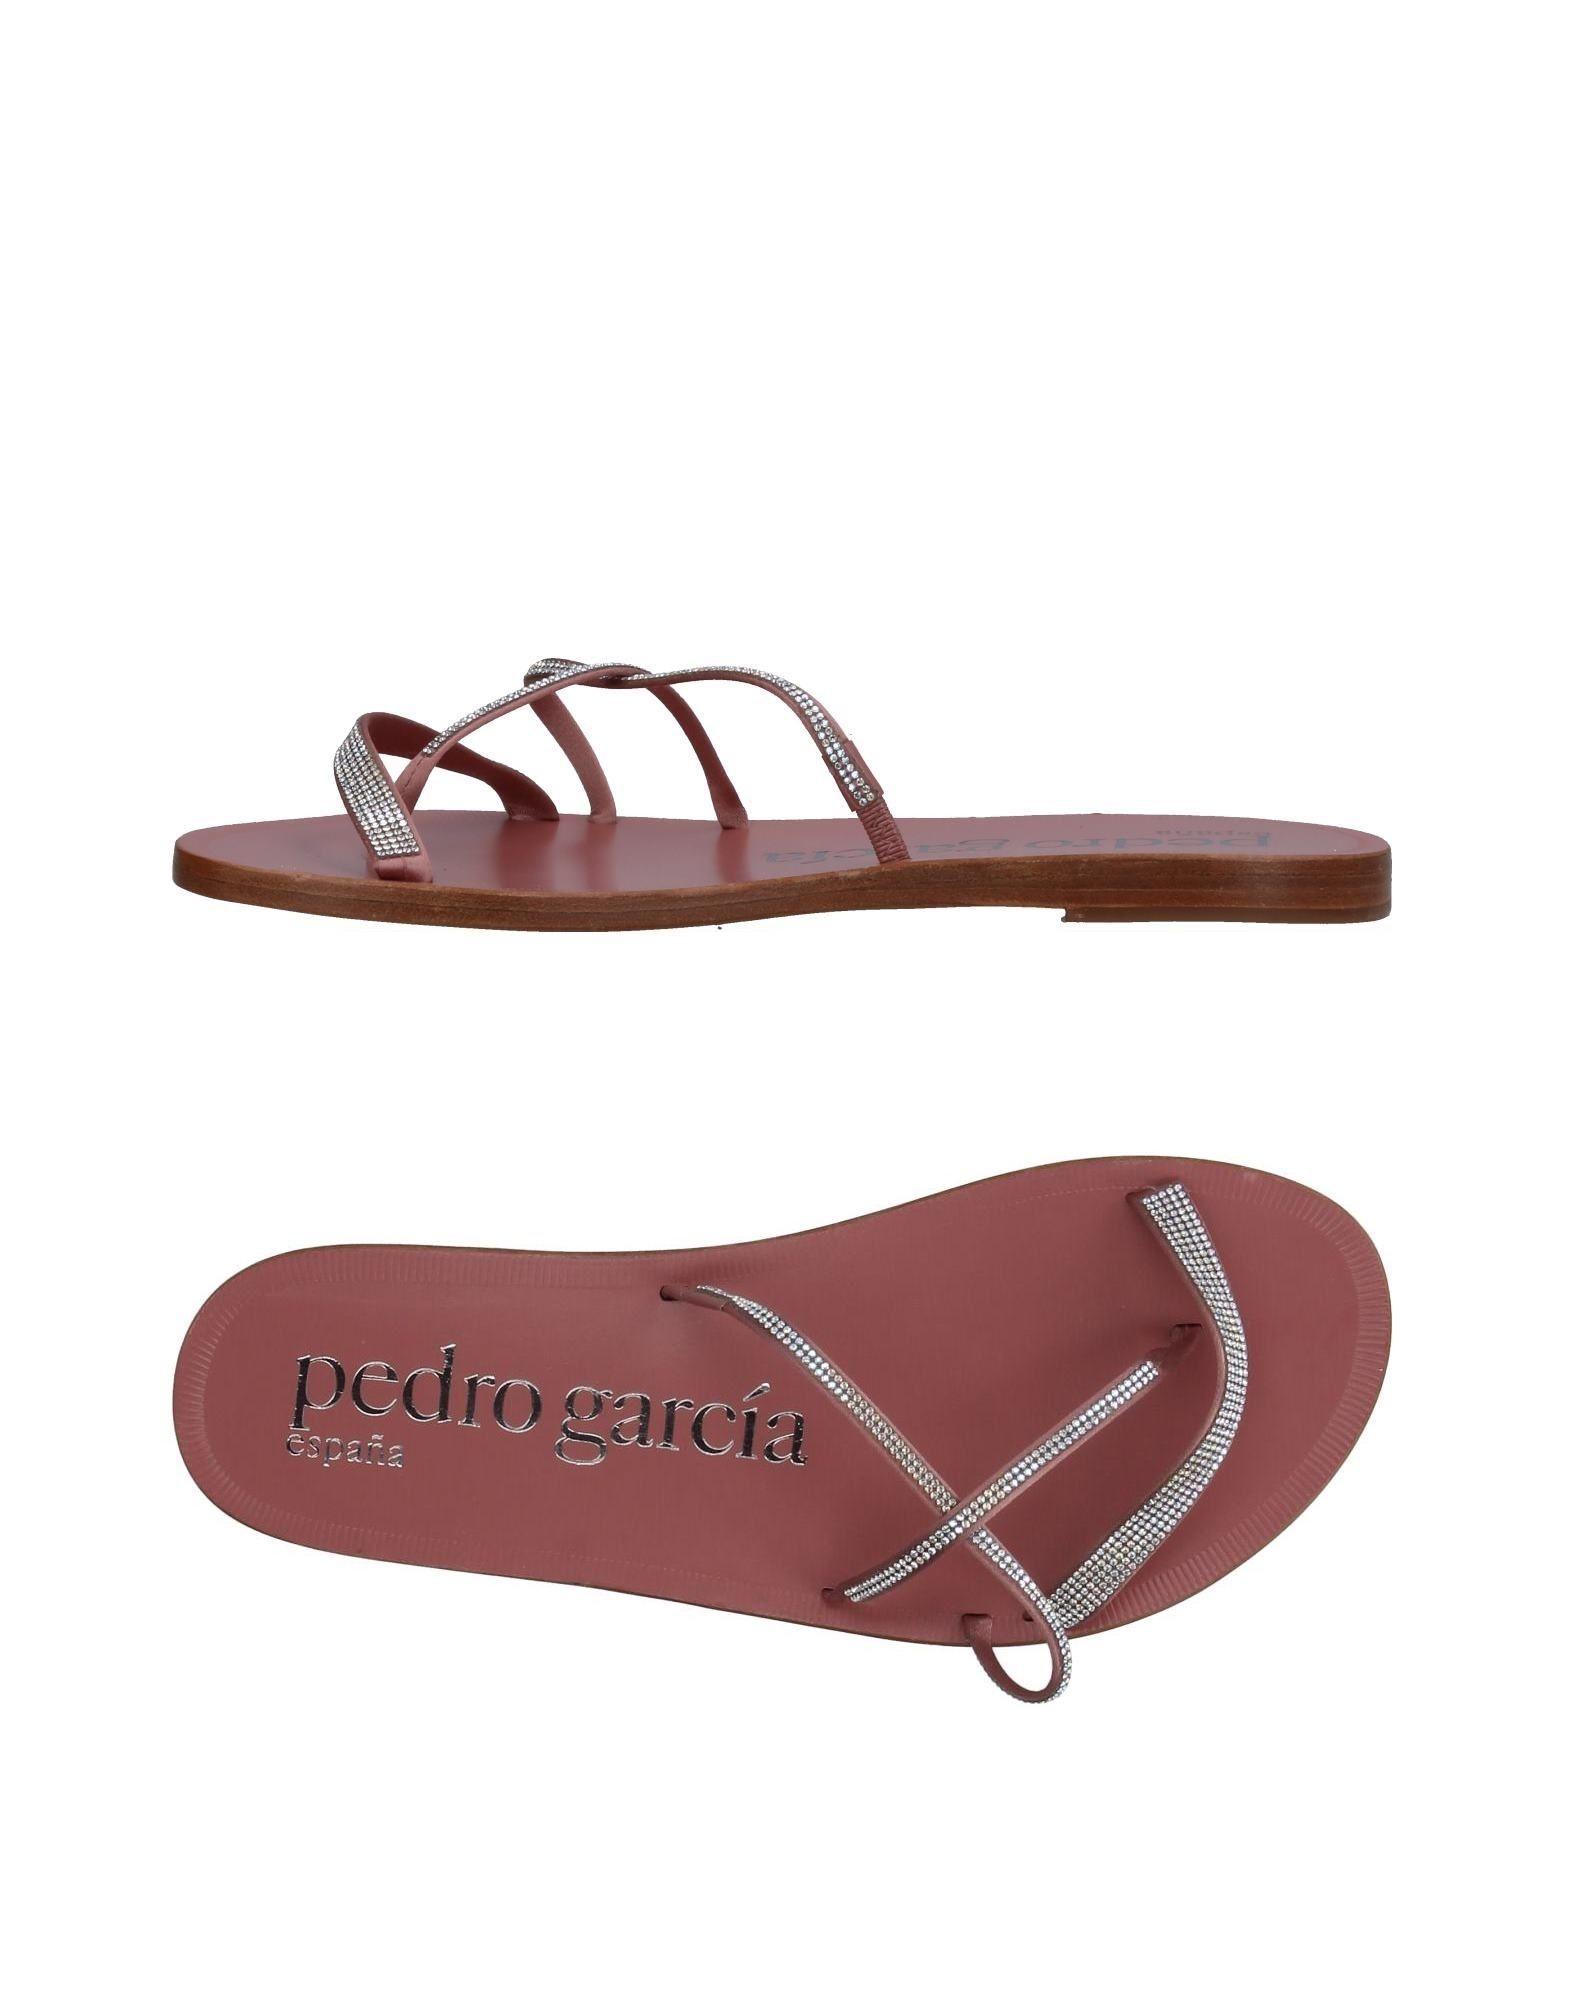 Stilvolle billige Schuhe Pedro García Dianetten Damen Damen Damen  11175667NJ bbbdb9